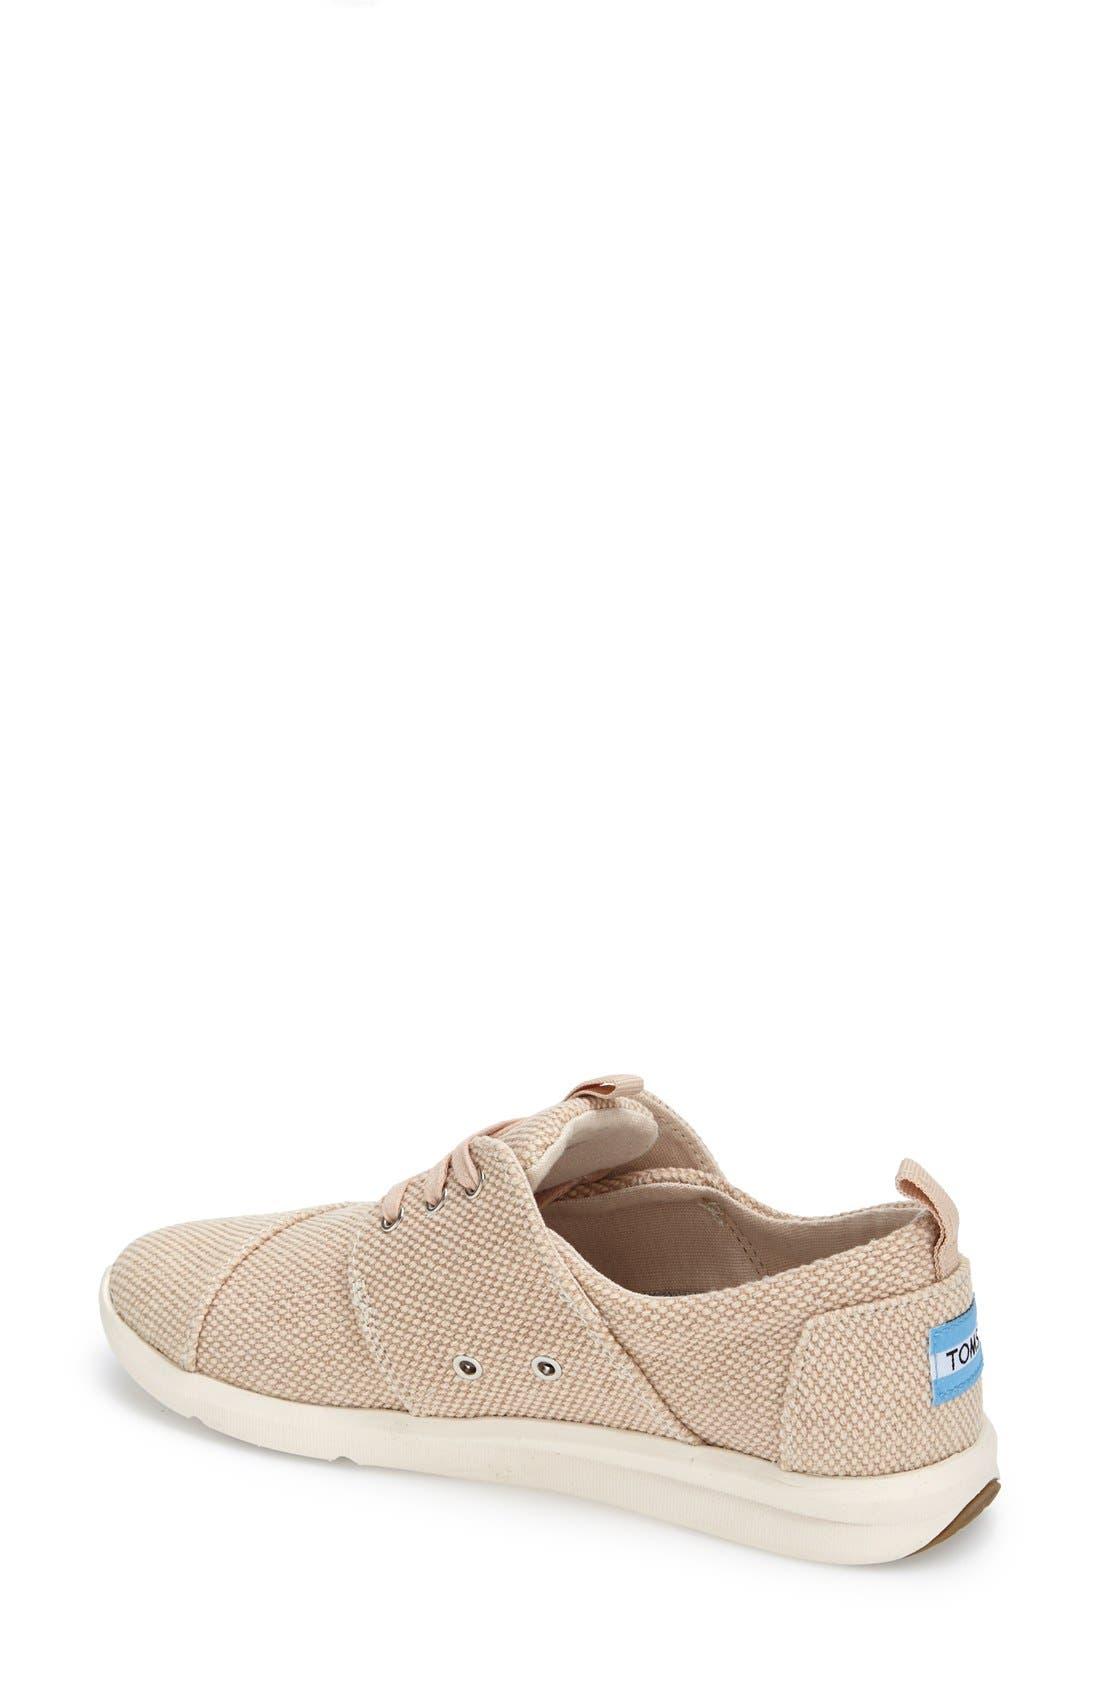 Alternate Image 2  - TOMS 'Del Rey' Sneaker (Women)